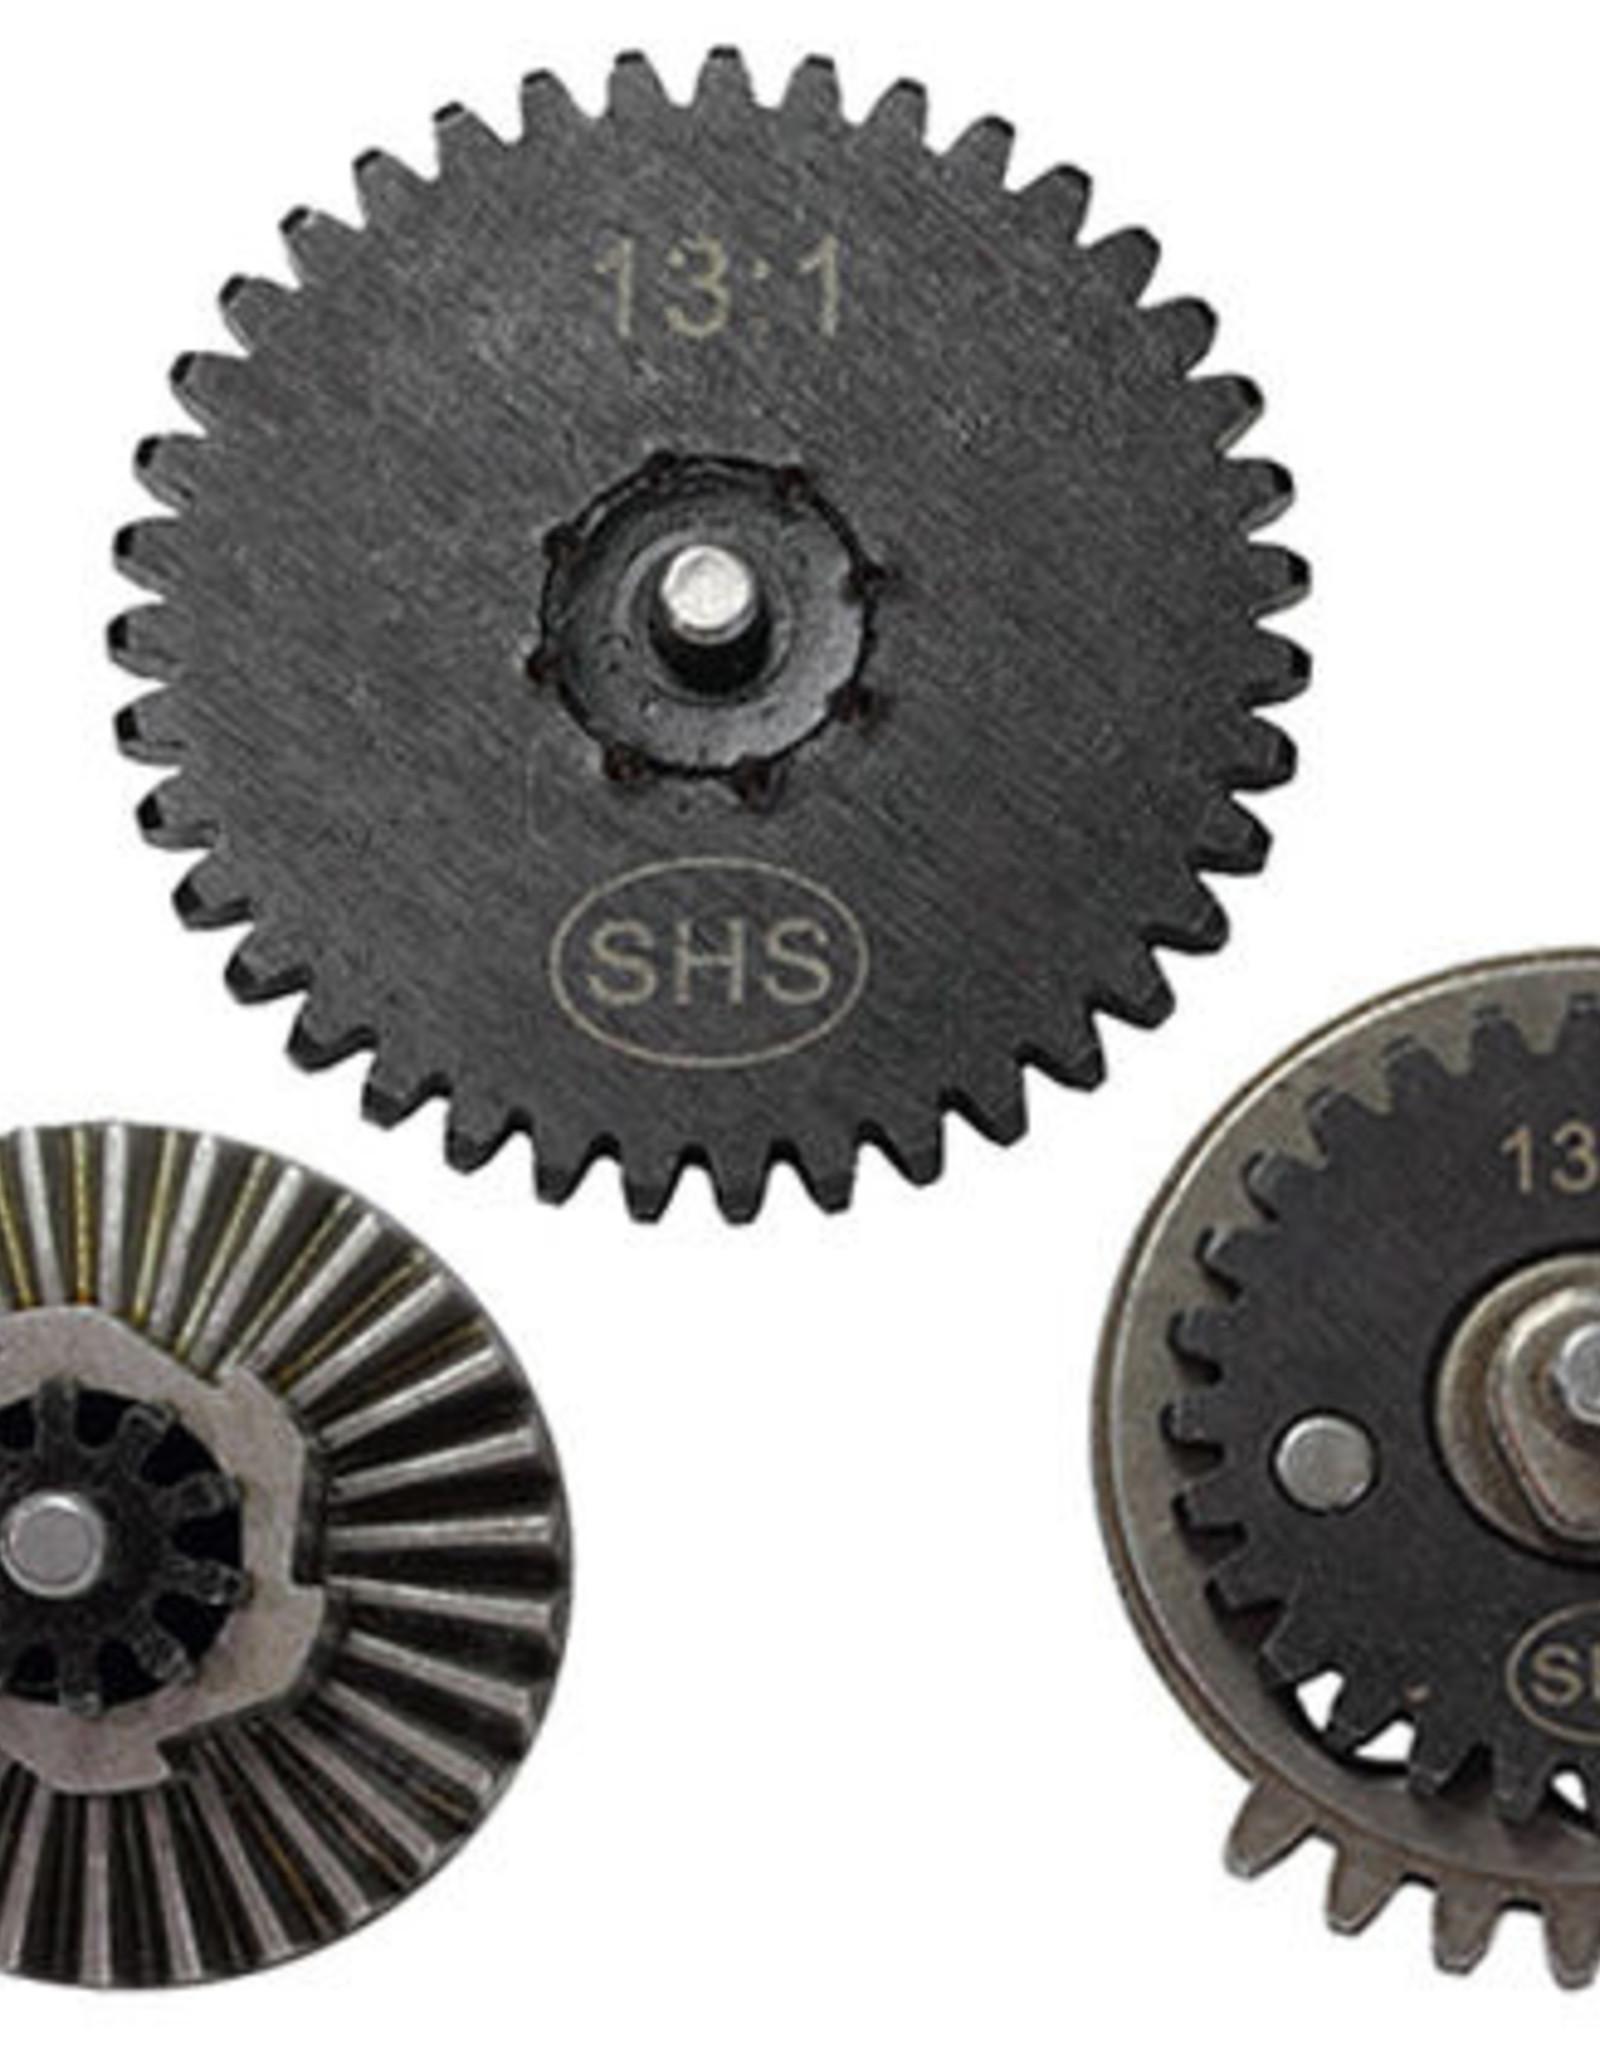 SHS SHS (RA) 13:1 GEARS